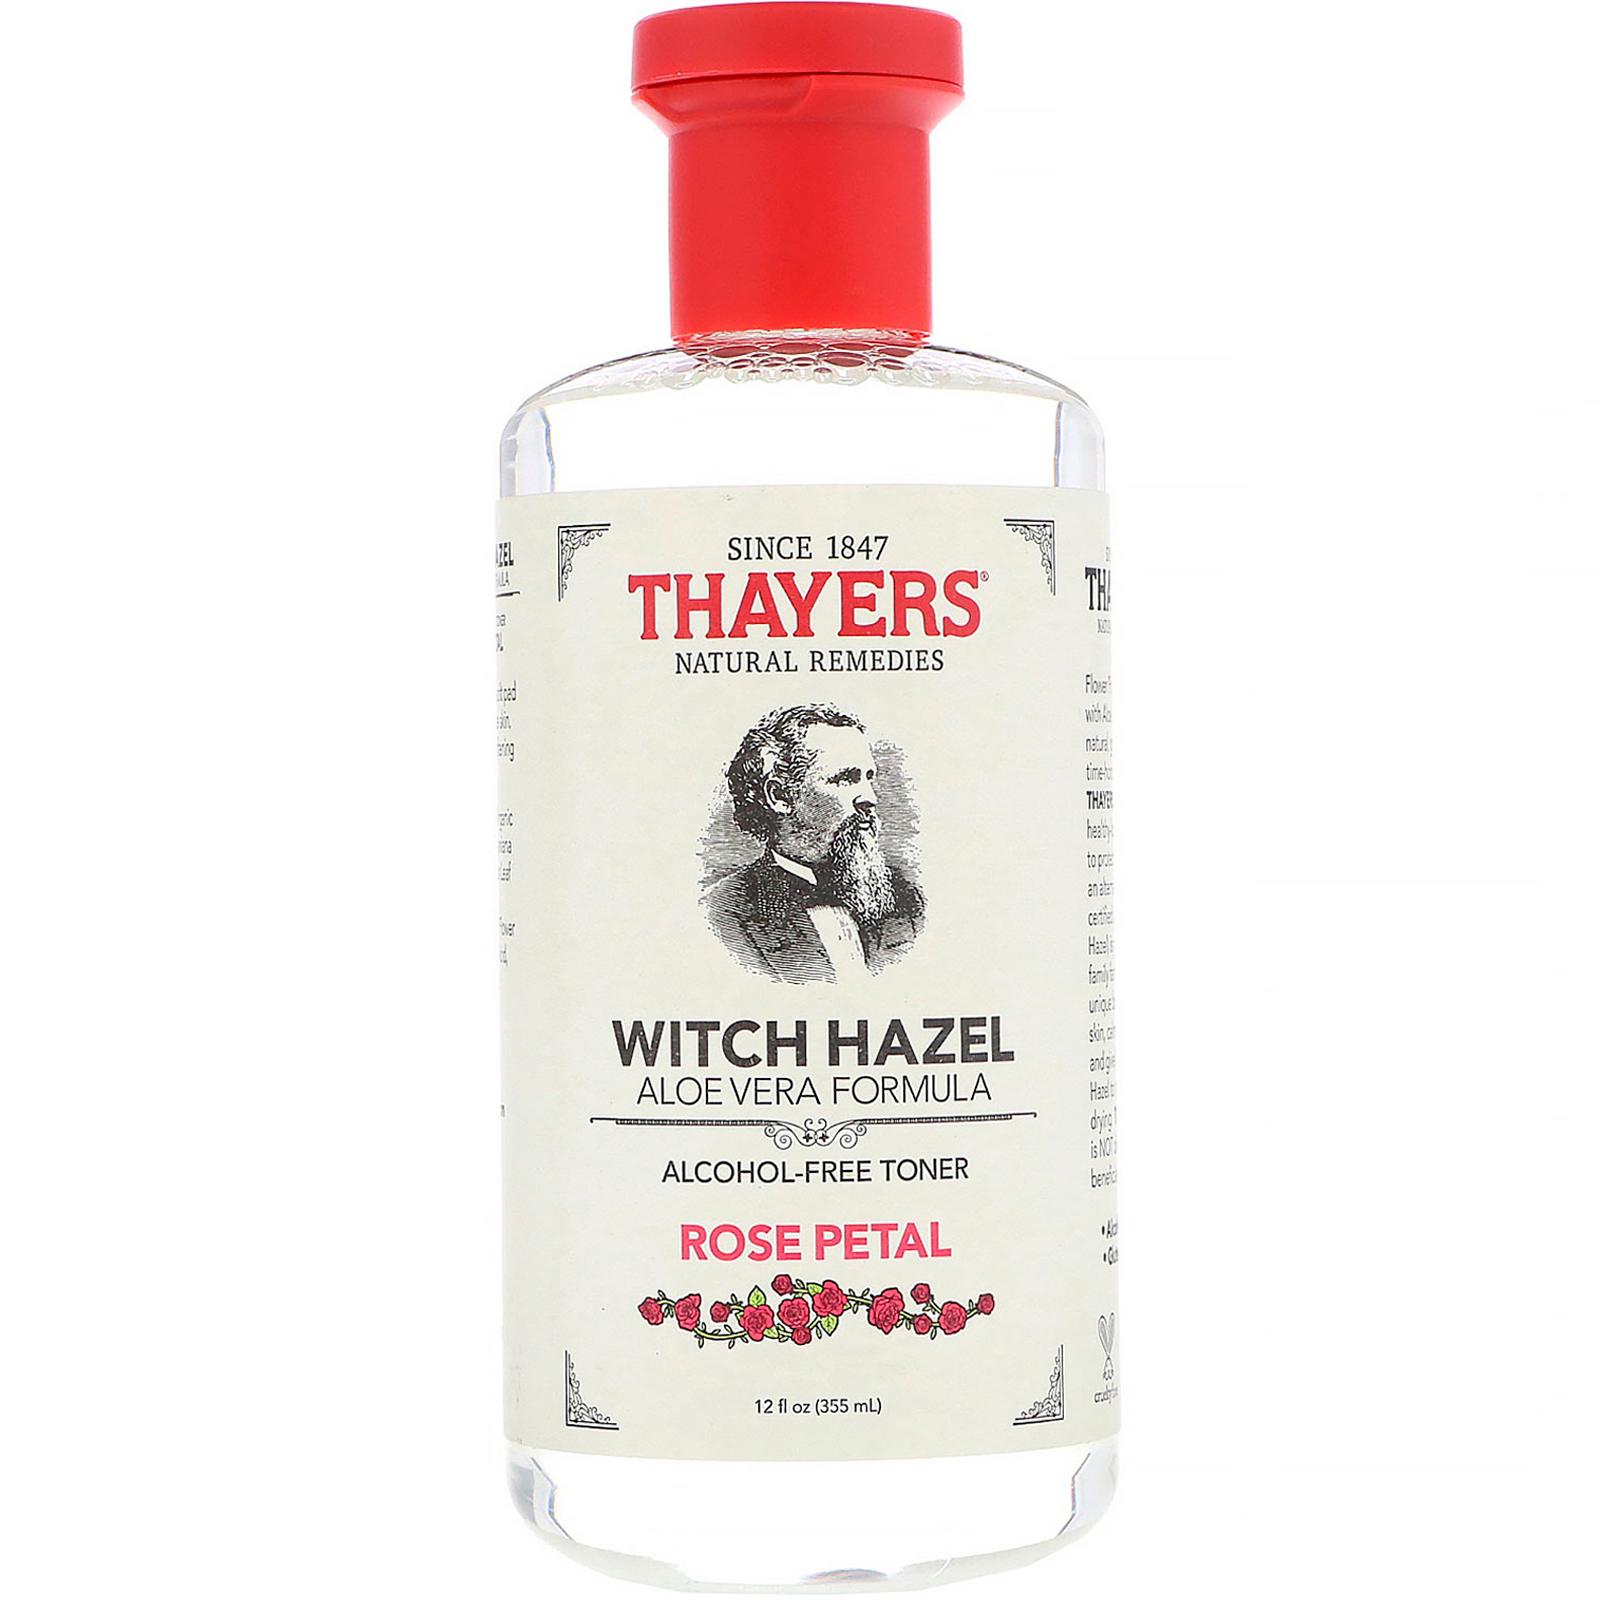 Thayers, Witch Hazel, Aloe Vera Formula, Alcohol-Free Toner, Rose Petal | 9 Best Toners in Singapore for Every Skin Type | magazine.vaniday.com